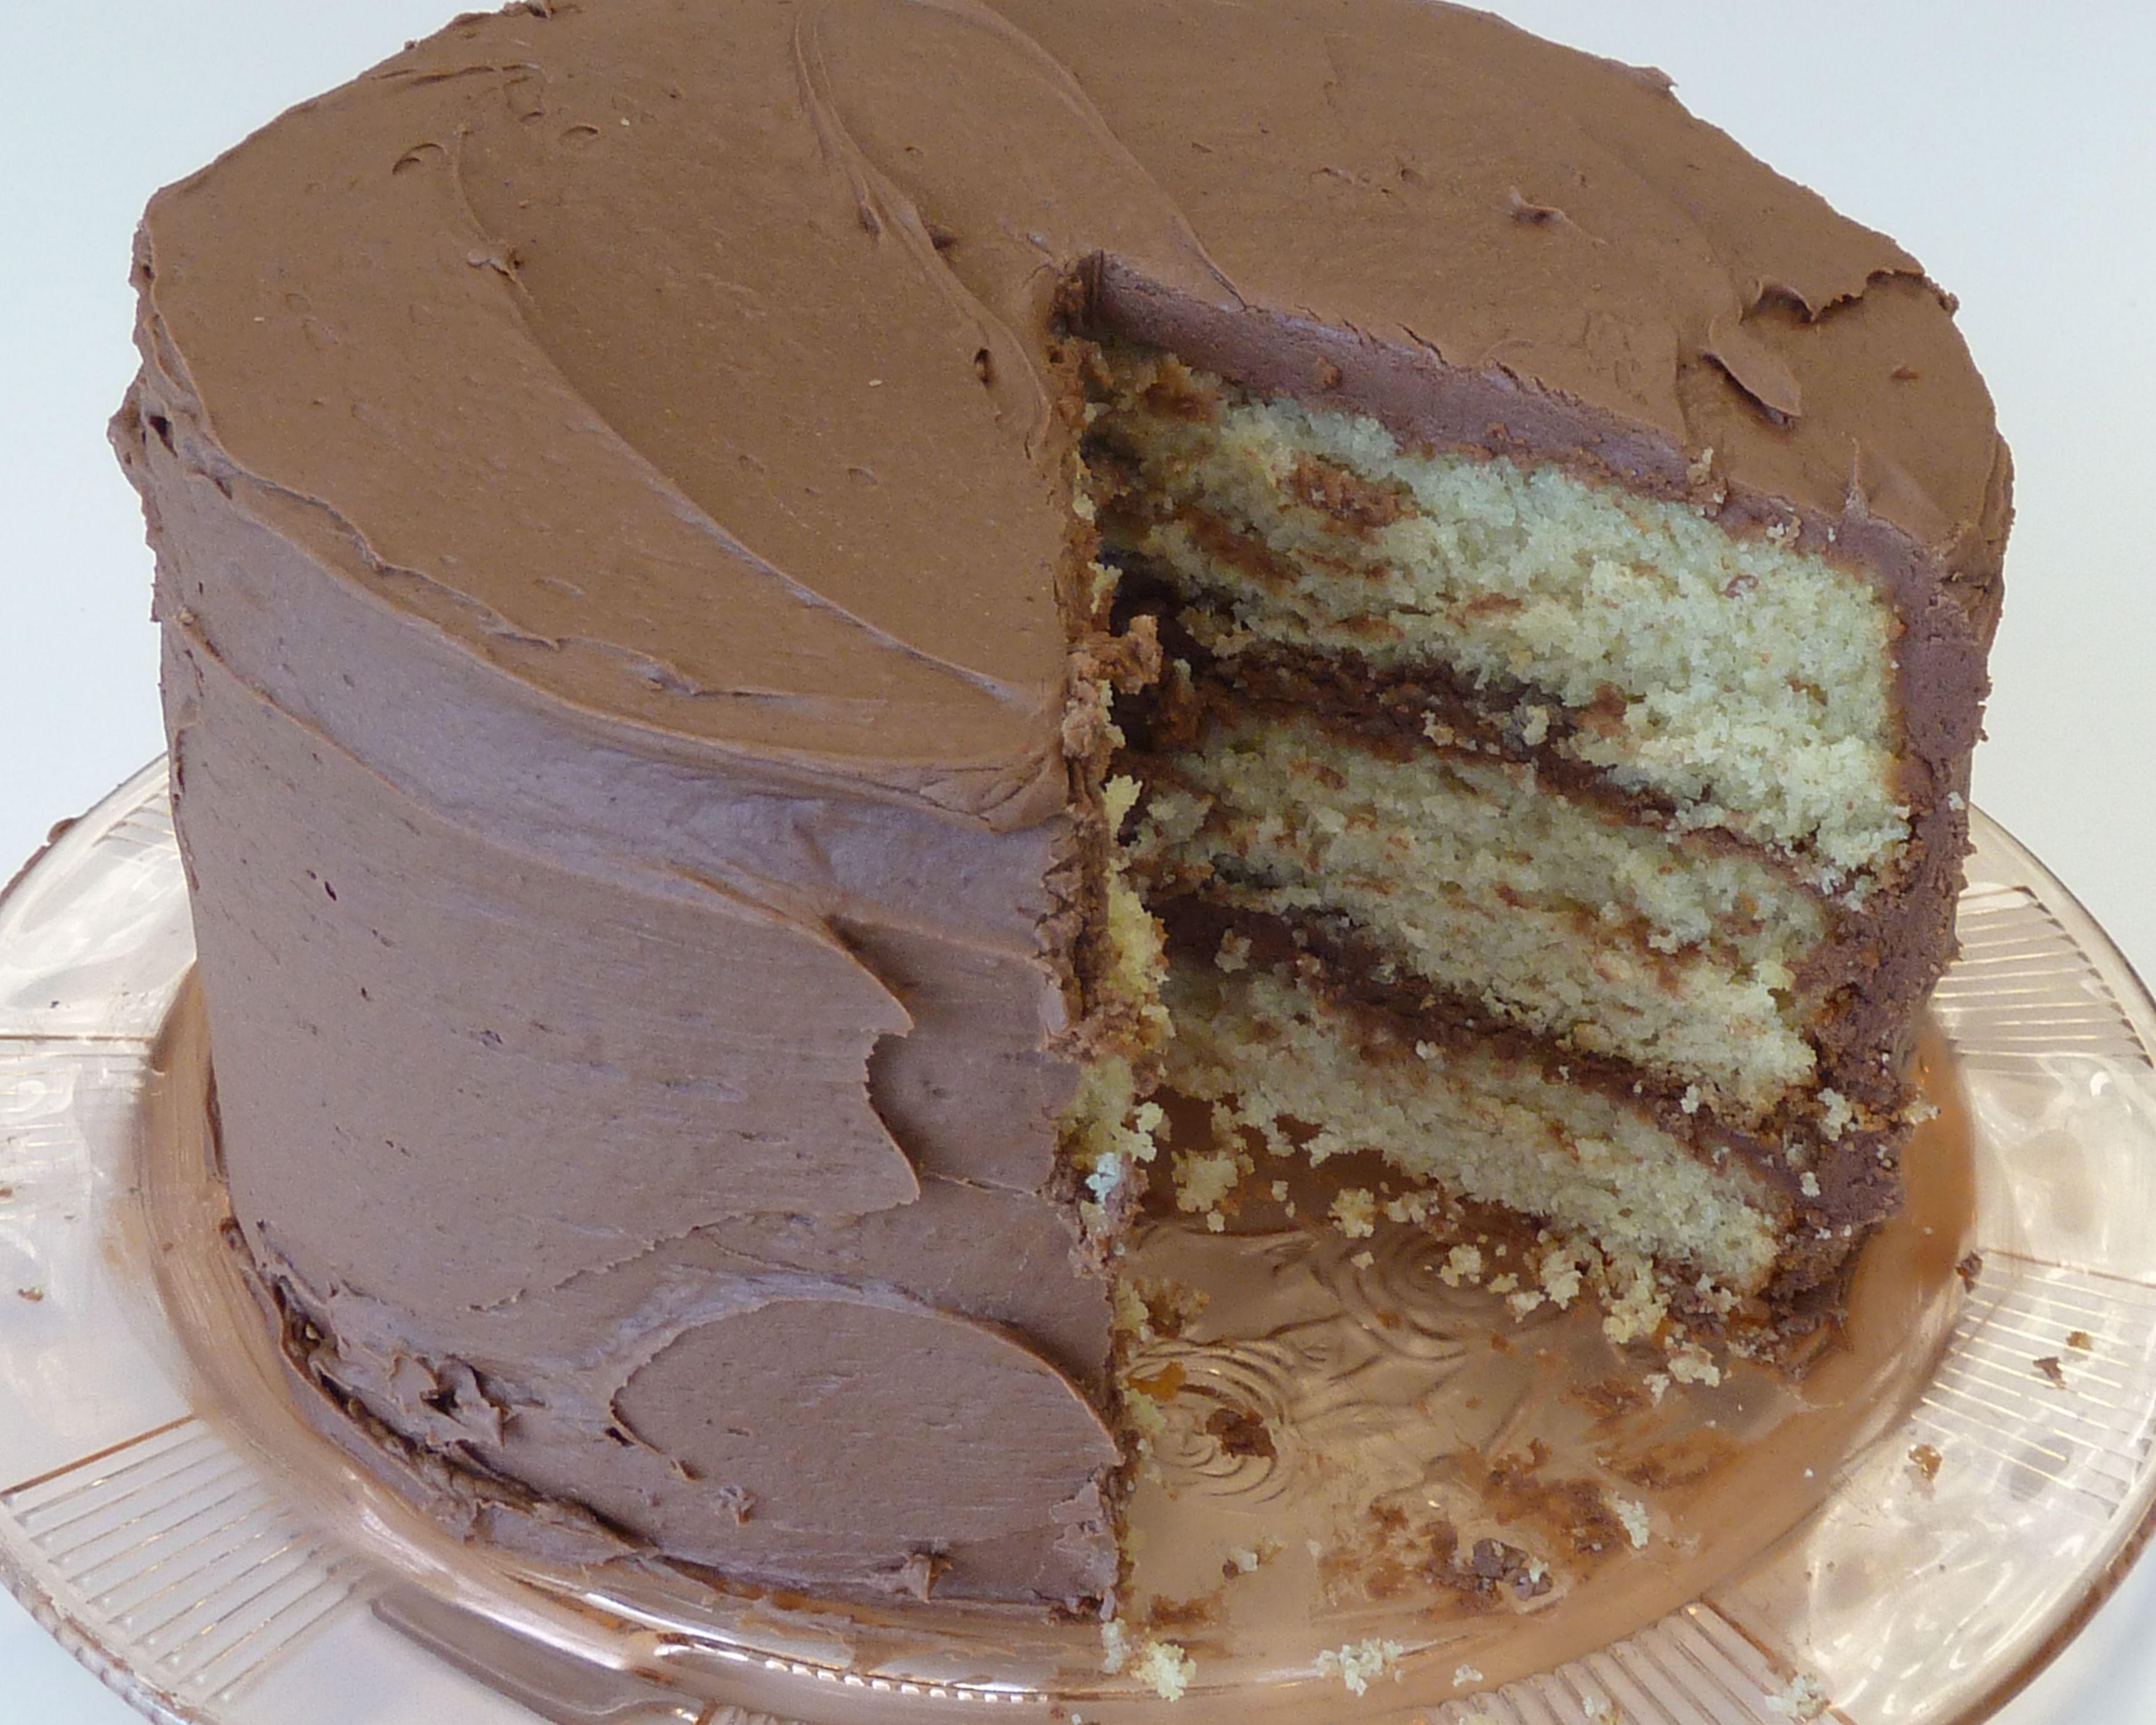 Homemade cakes from scratch cake jessica maine blog for How to make a homemade cake from scratch